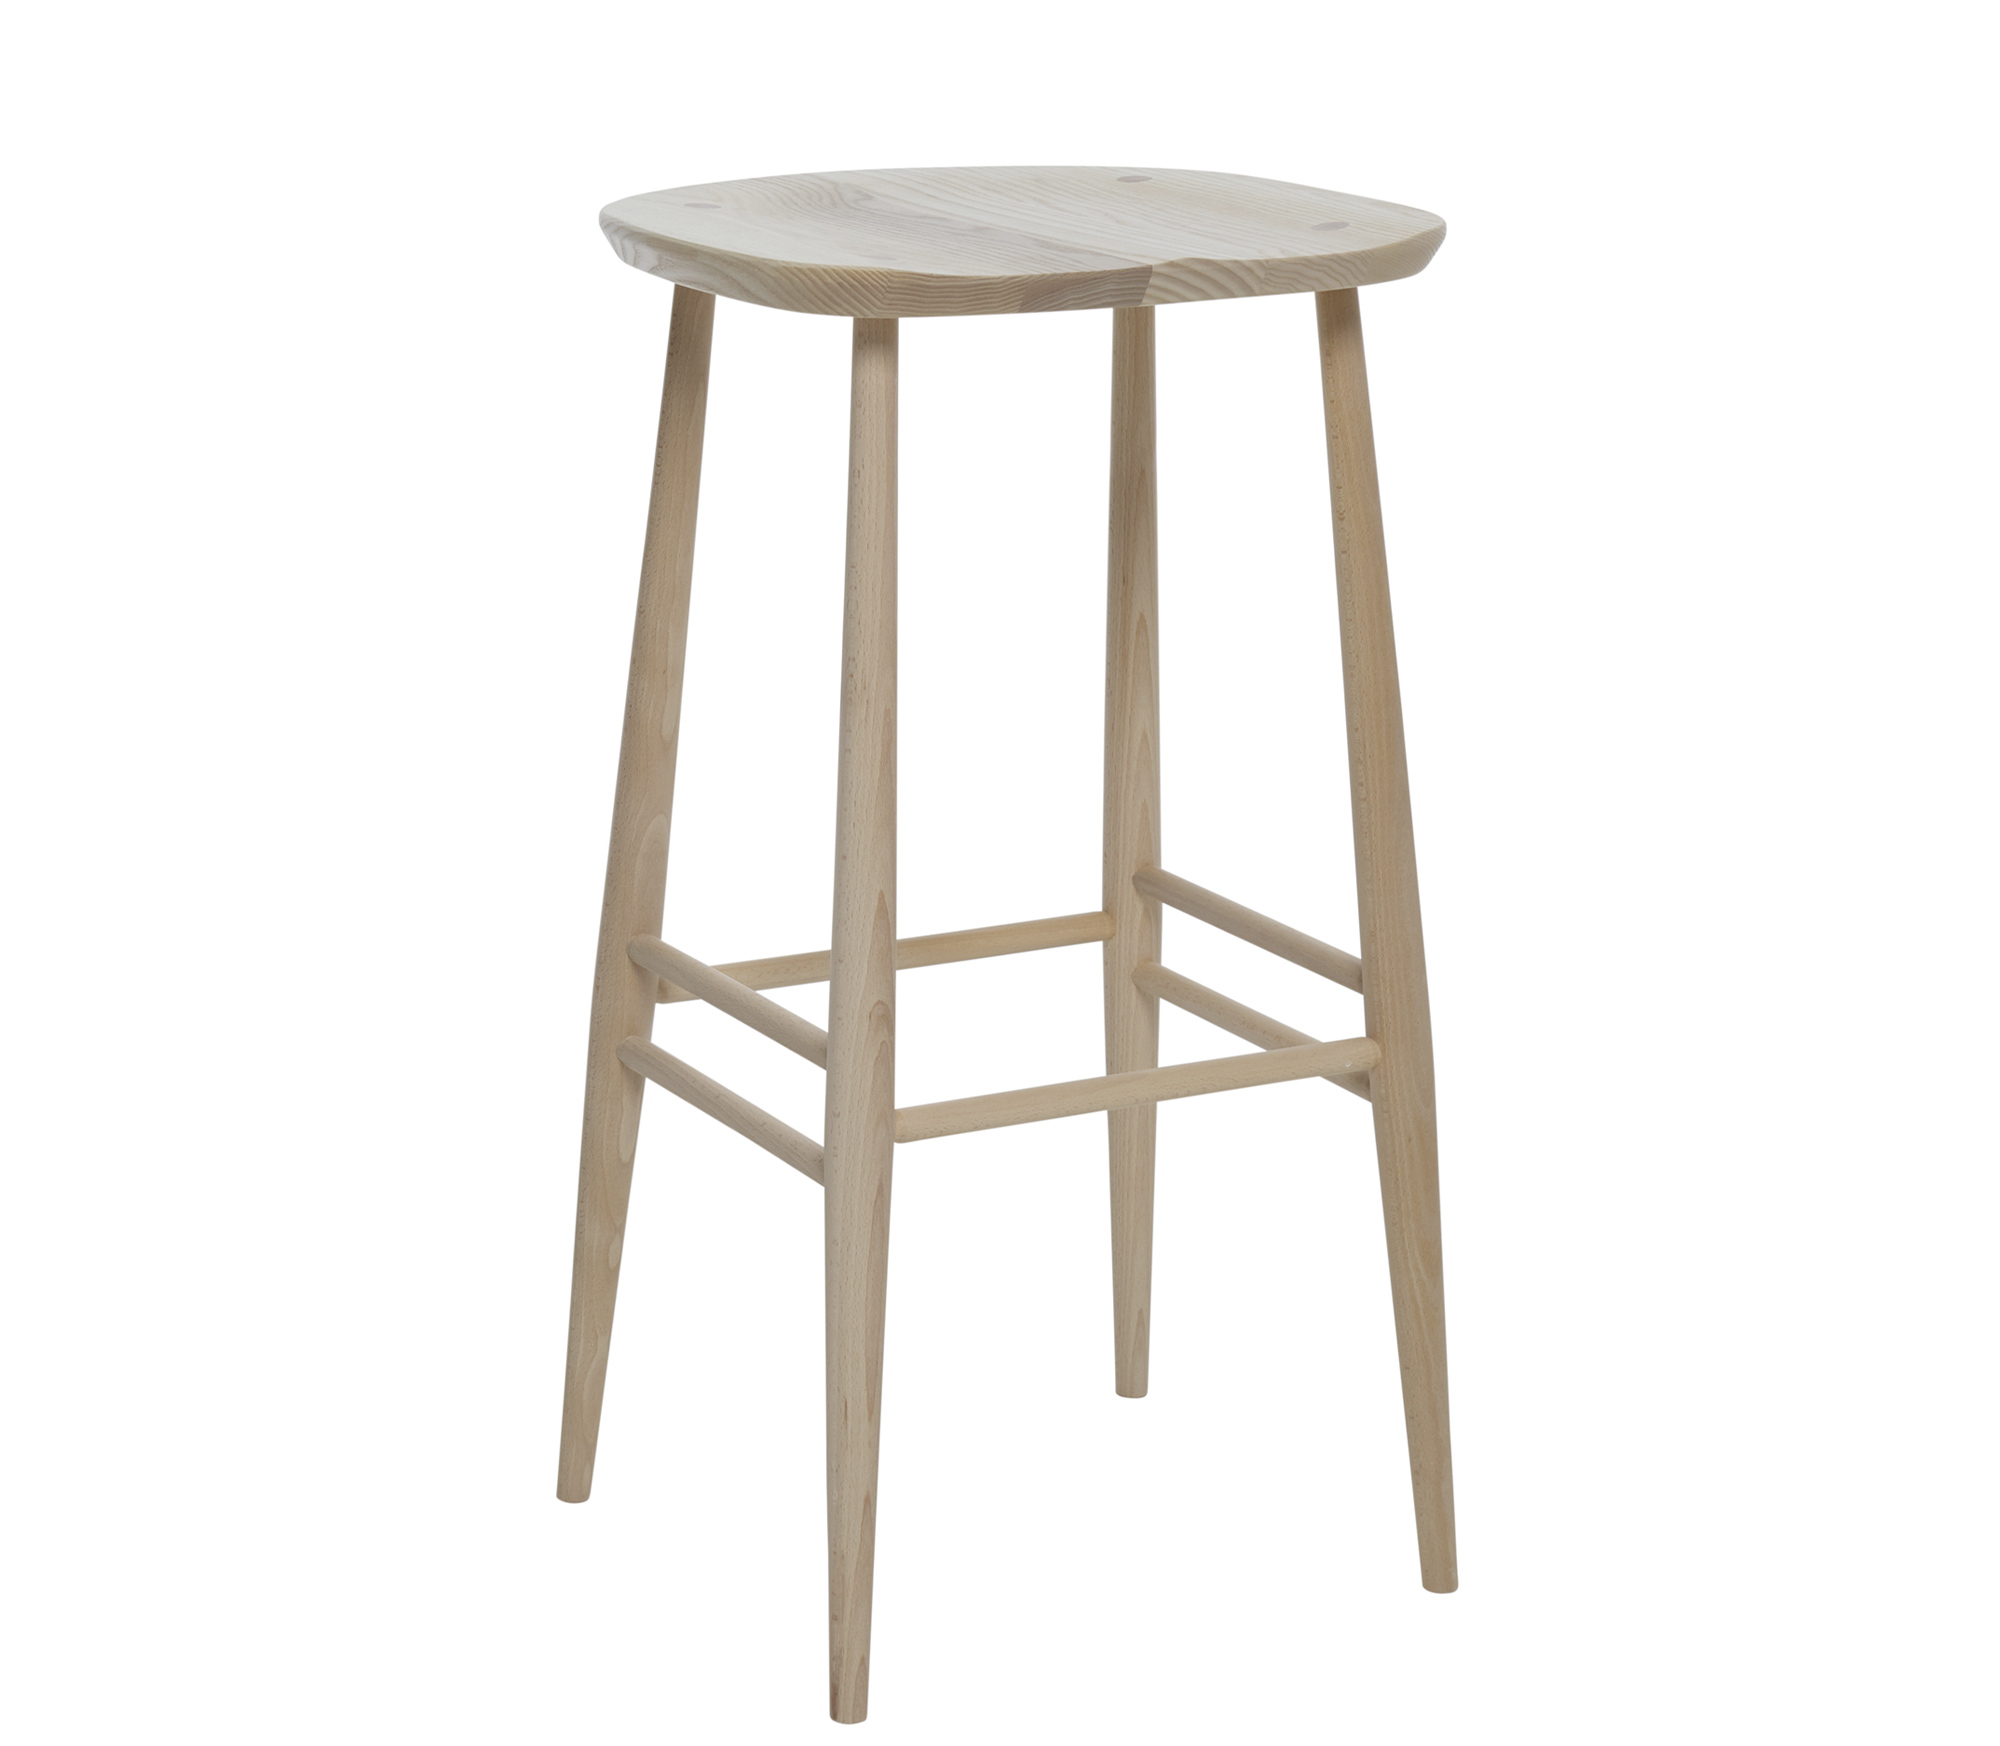 Originals Bar Stool Tall Ercol Furniture